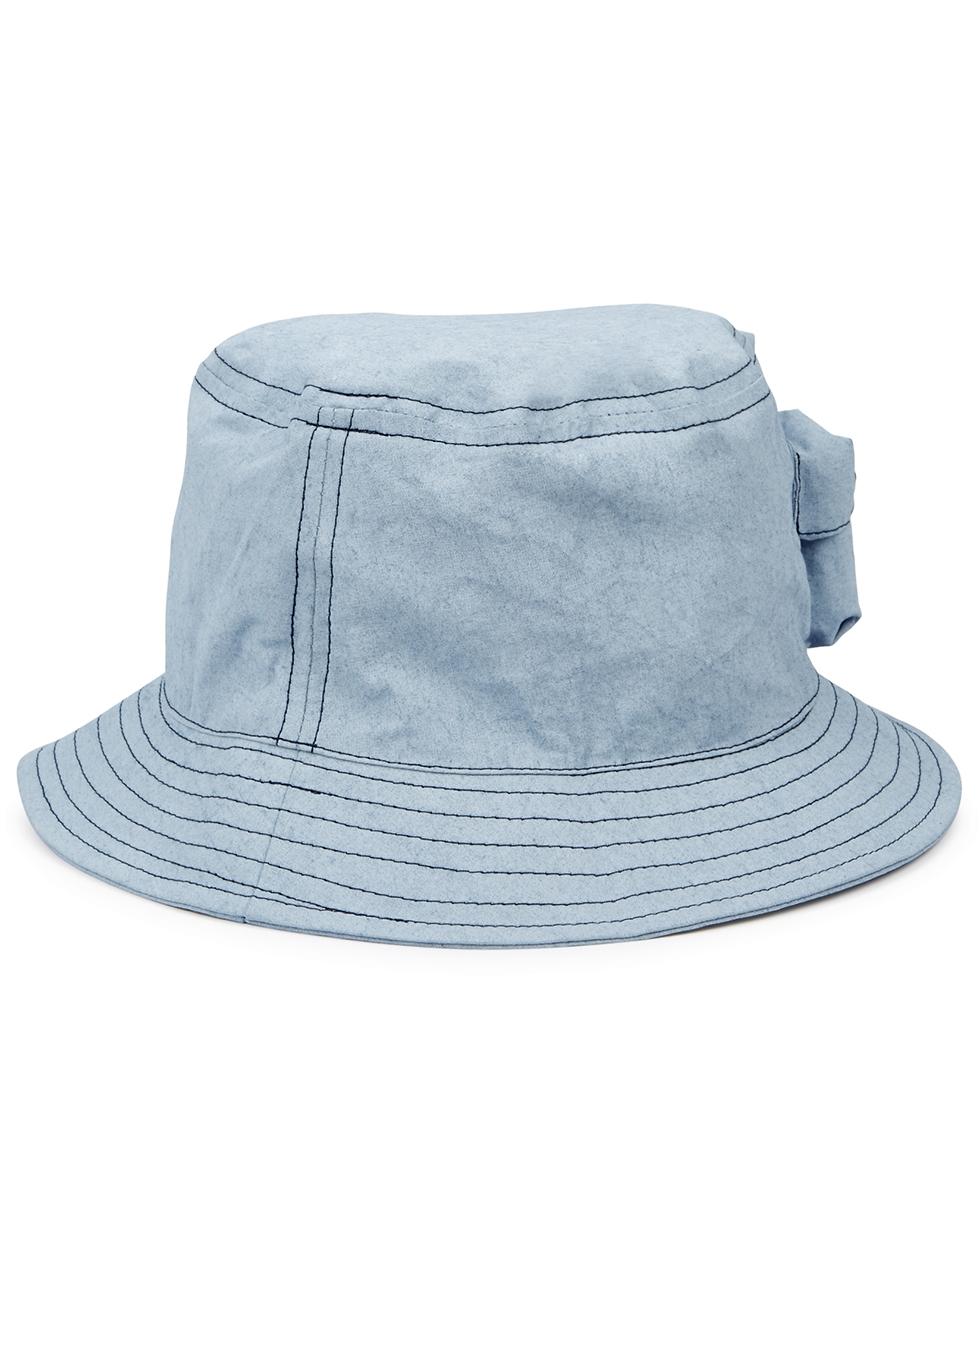 Blue coated cotton bucket hat - Stone Island